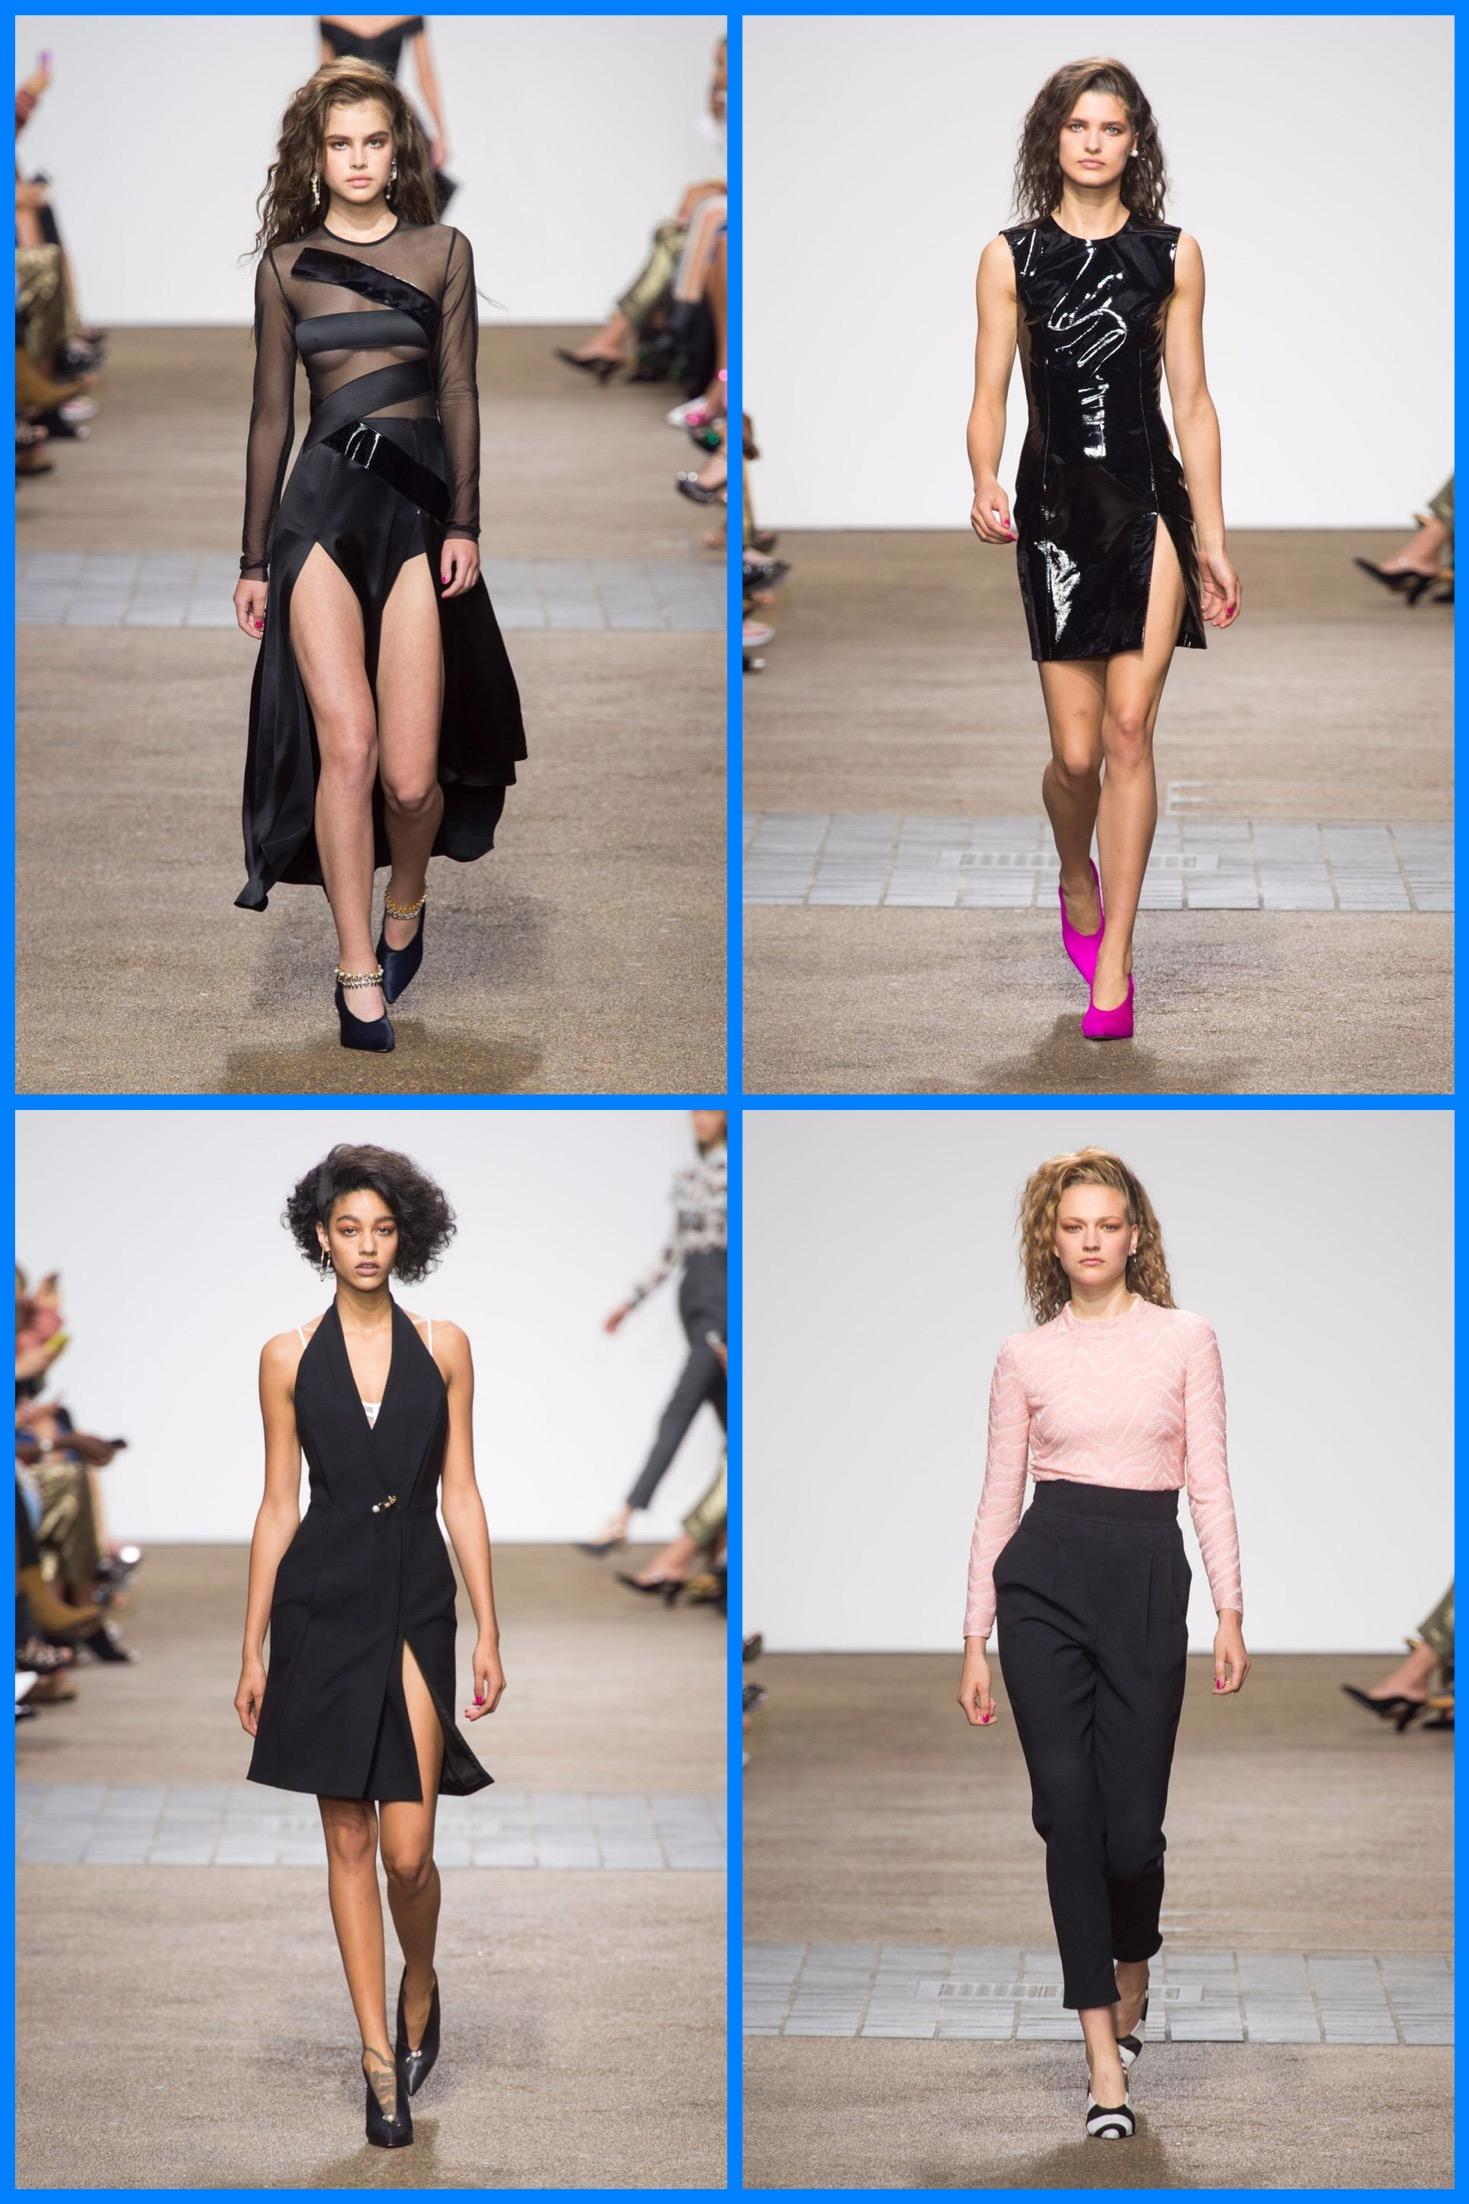 london-fashion-week-pret-a-porter-spring-summer-2017-style-topshop-unique